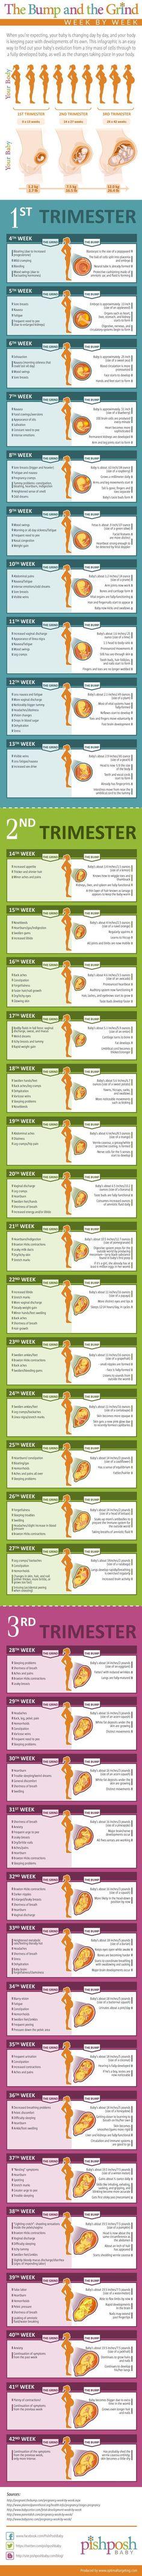 Pregnancy Week by Week Chart - Fun - - Schwanger - Pregnant Tips Pregnancy Chart, Pregnancy Info, Pregnancy Weeks, Early Pregnancy, Pregnancy Timeline, Pregnancy Trimester Chart, Pregnancy Health, Pregnancy Symptoms By Week, Pregnancy Facts